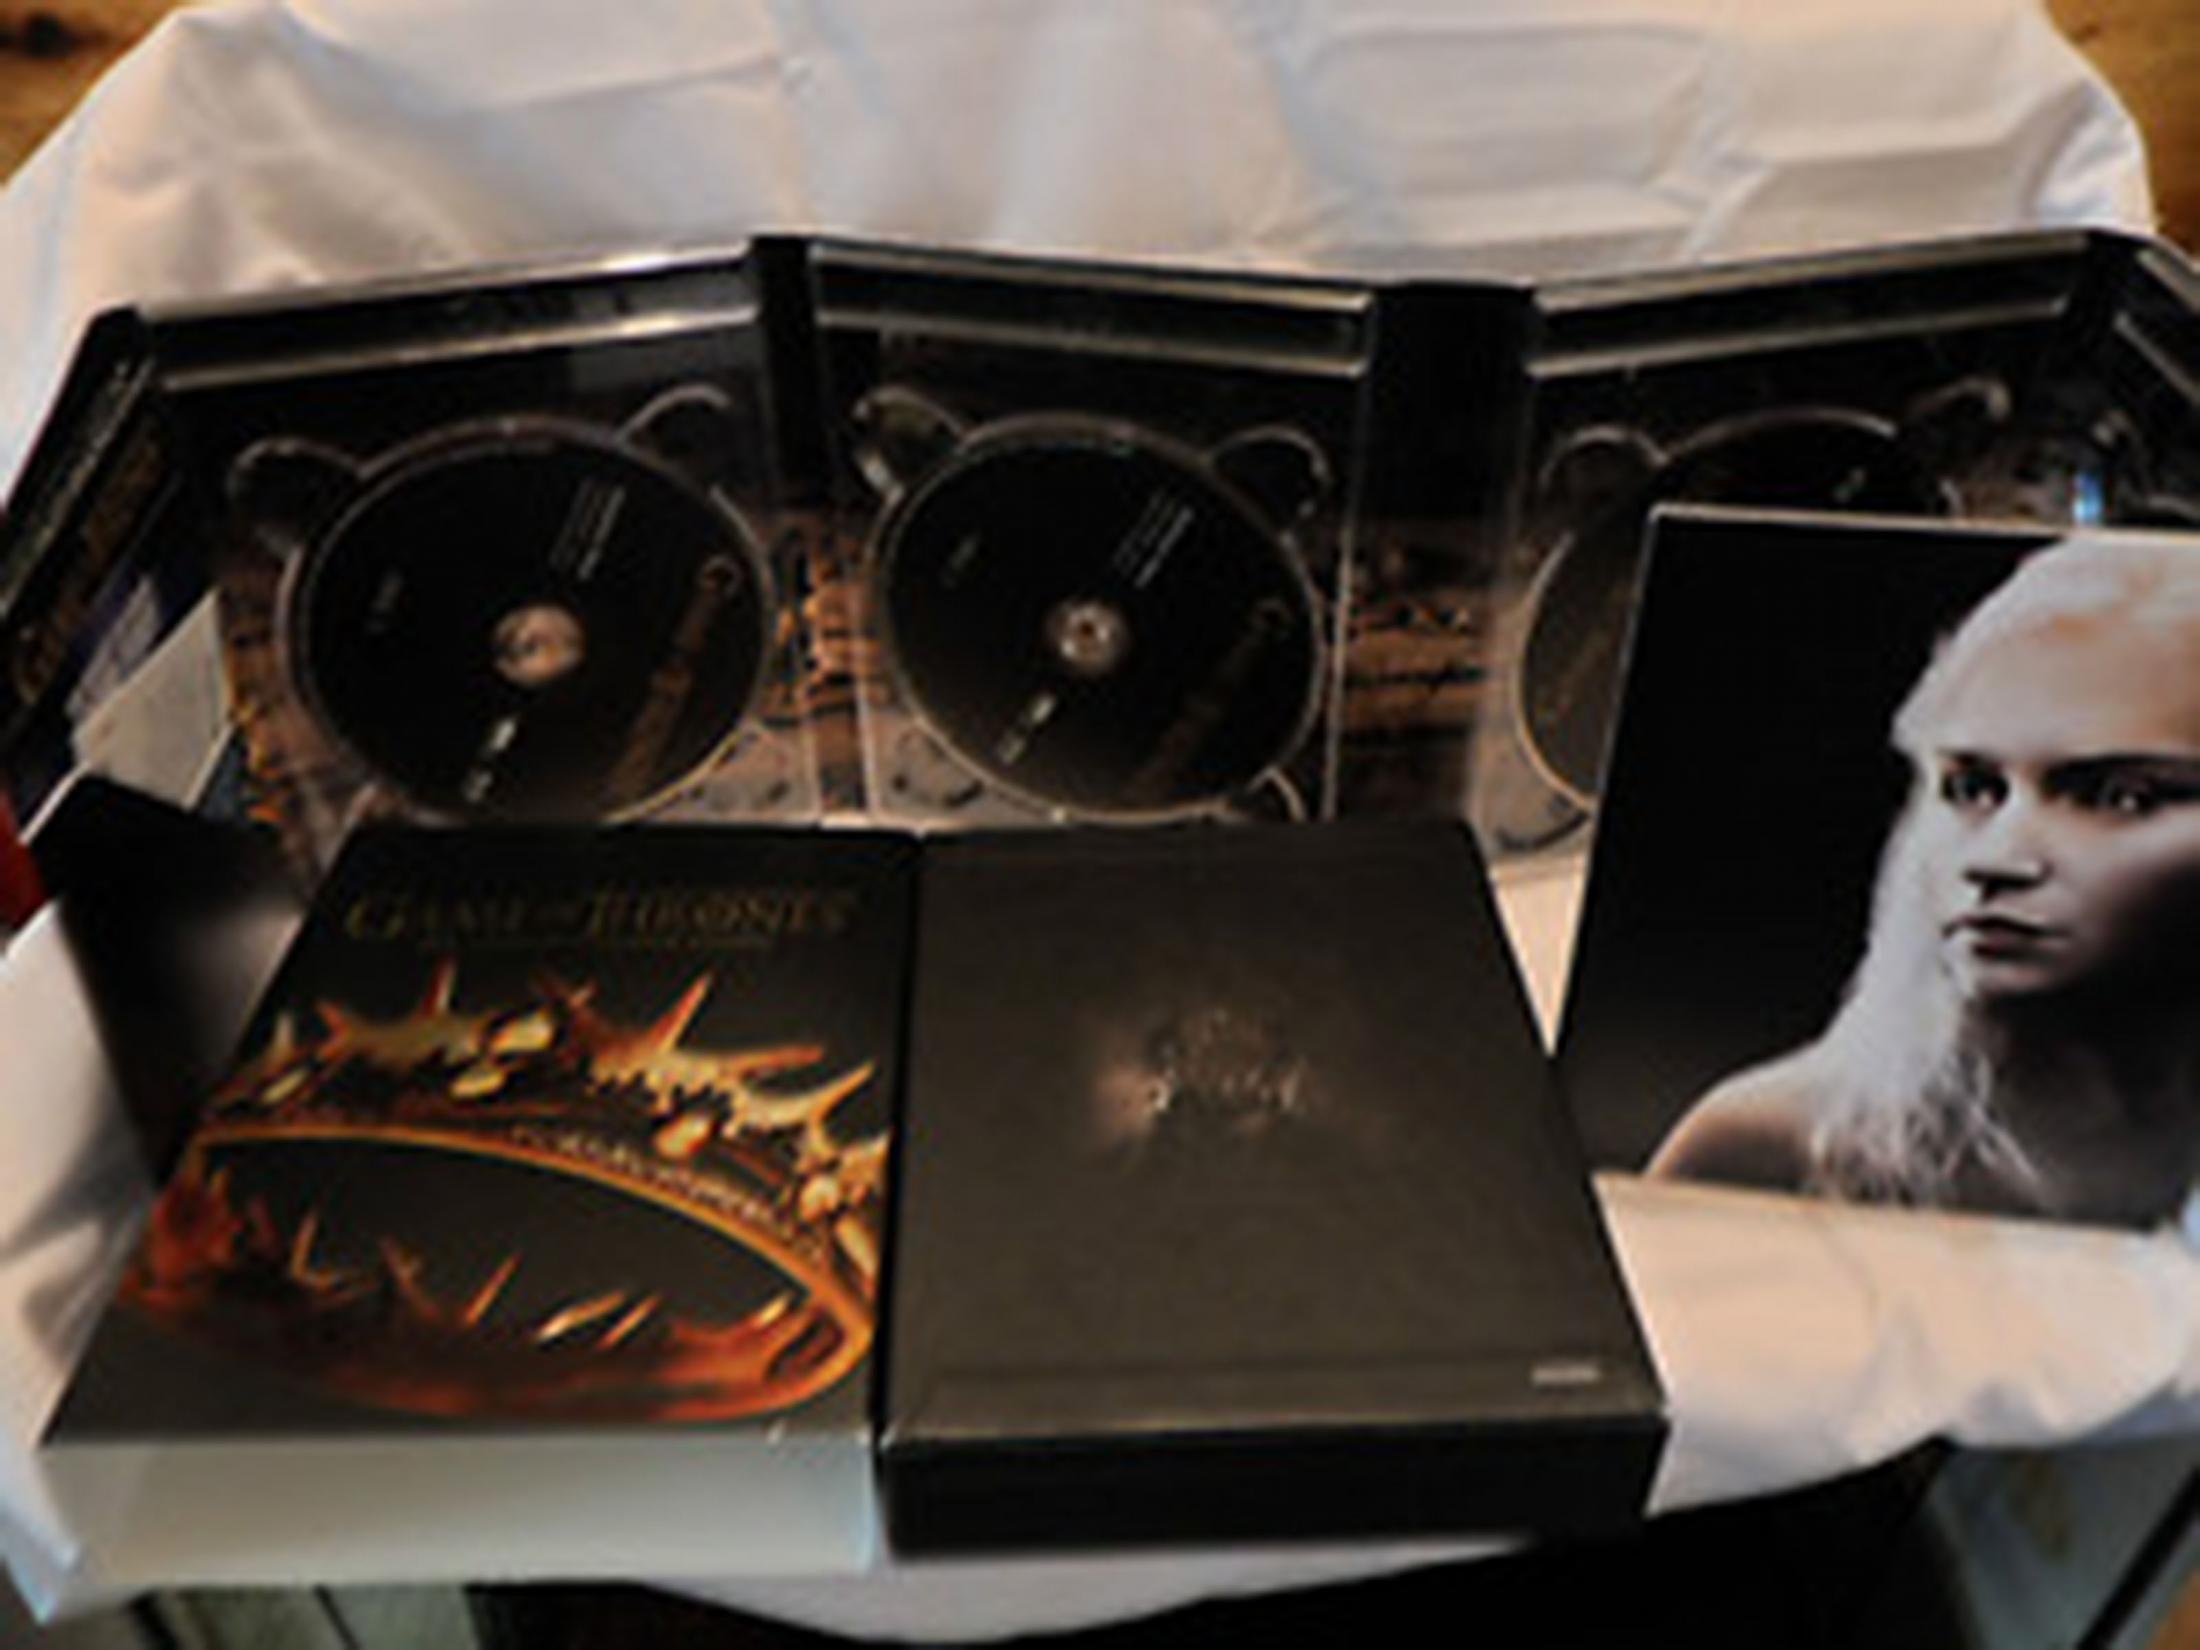 Game Of Thrones Season 2 Complete Series Dvd Set Clios